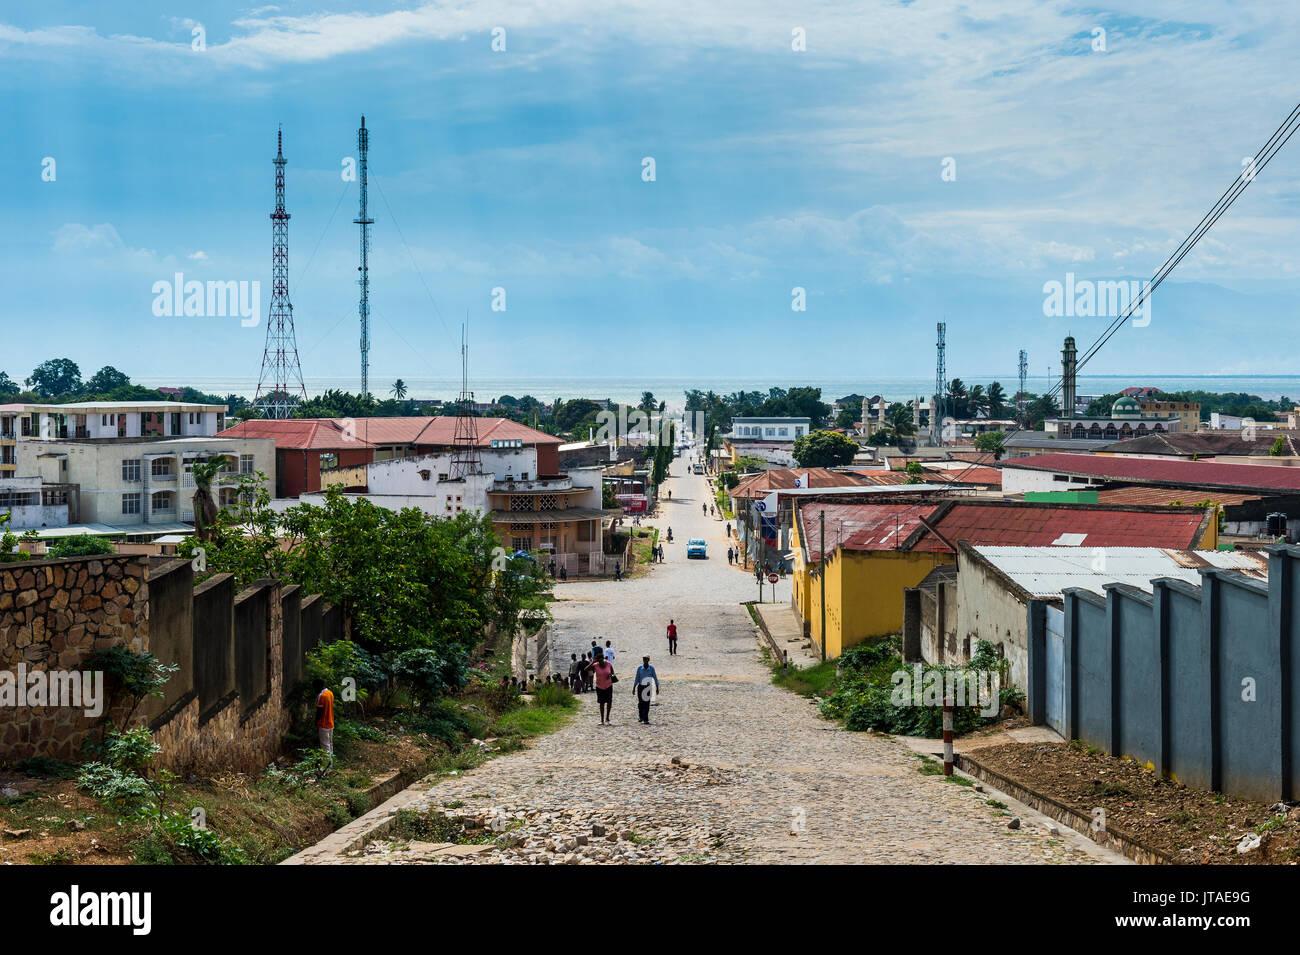 Bujumbura Images, Stock Photos & Vectors | Shutterstock